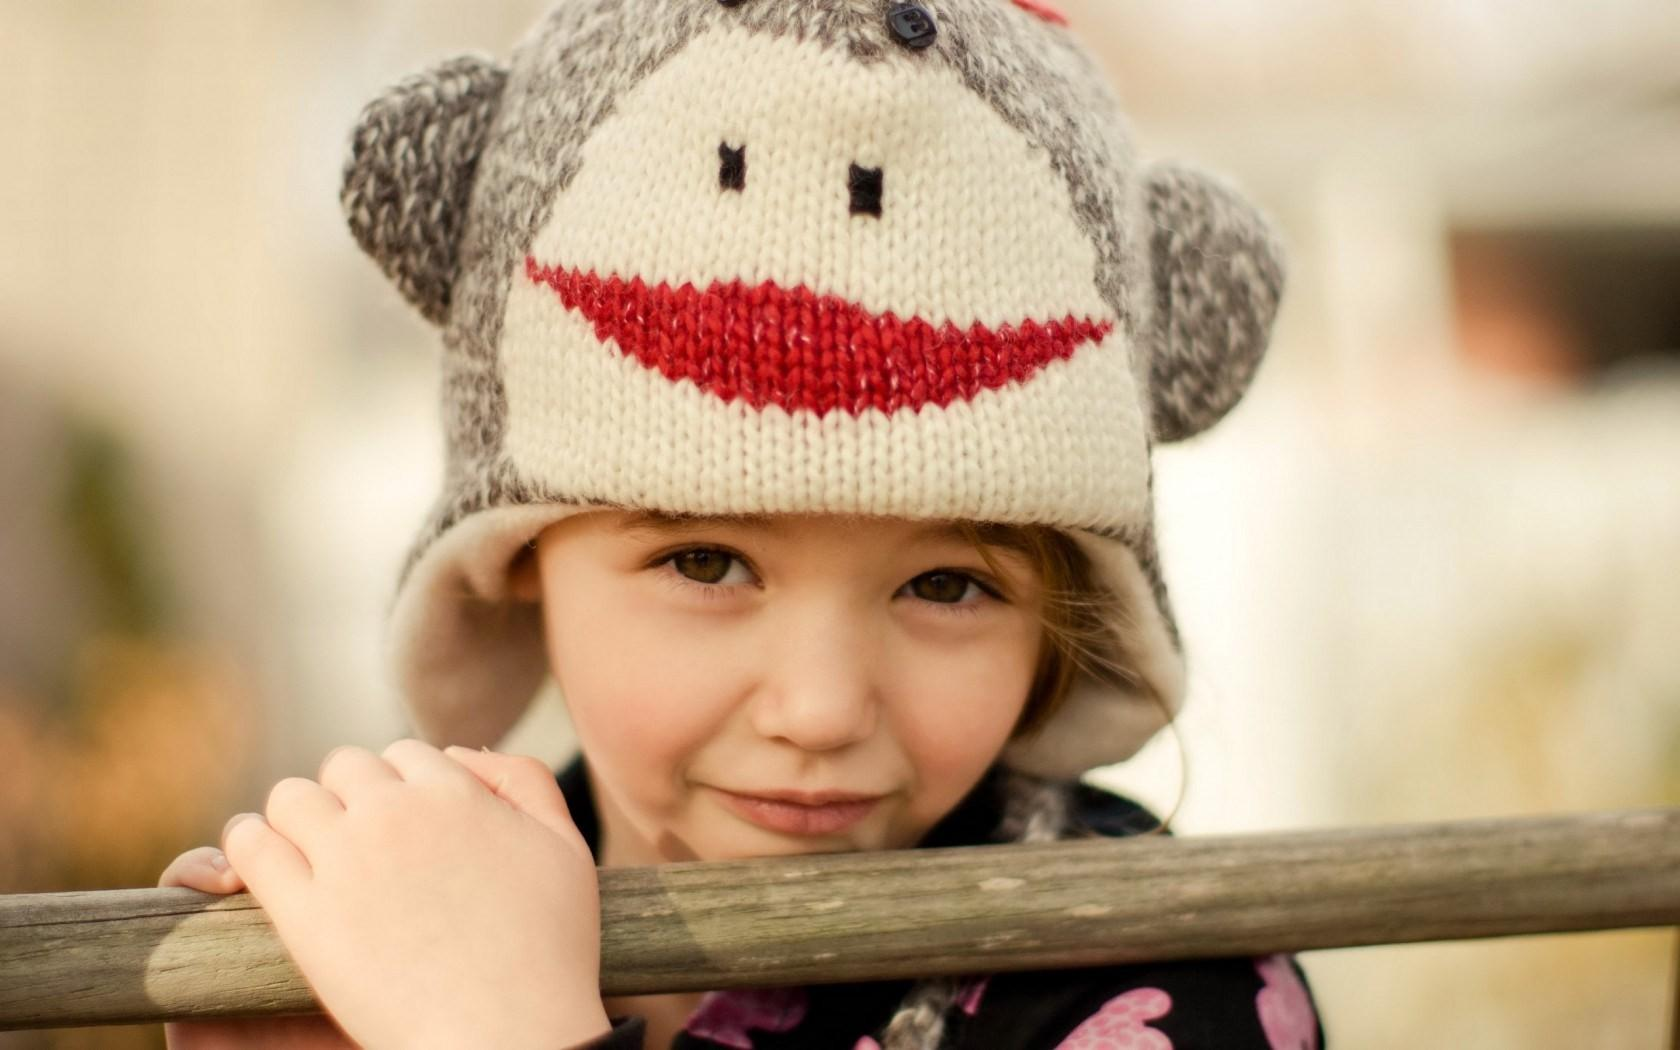 بالصور صور اولاد حلوين , شاهد بالصور اجمل الاطفال الاولاد 429 9